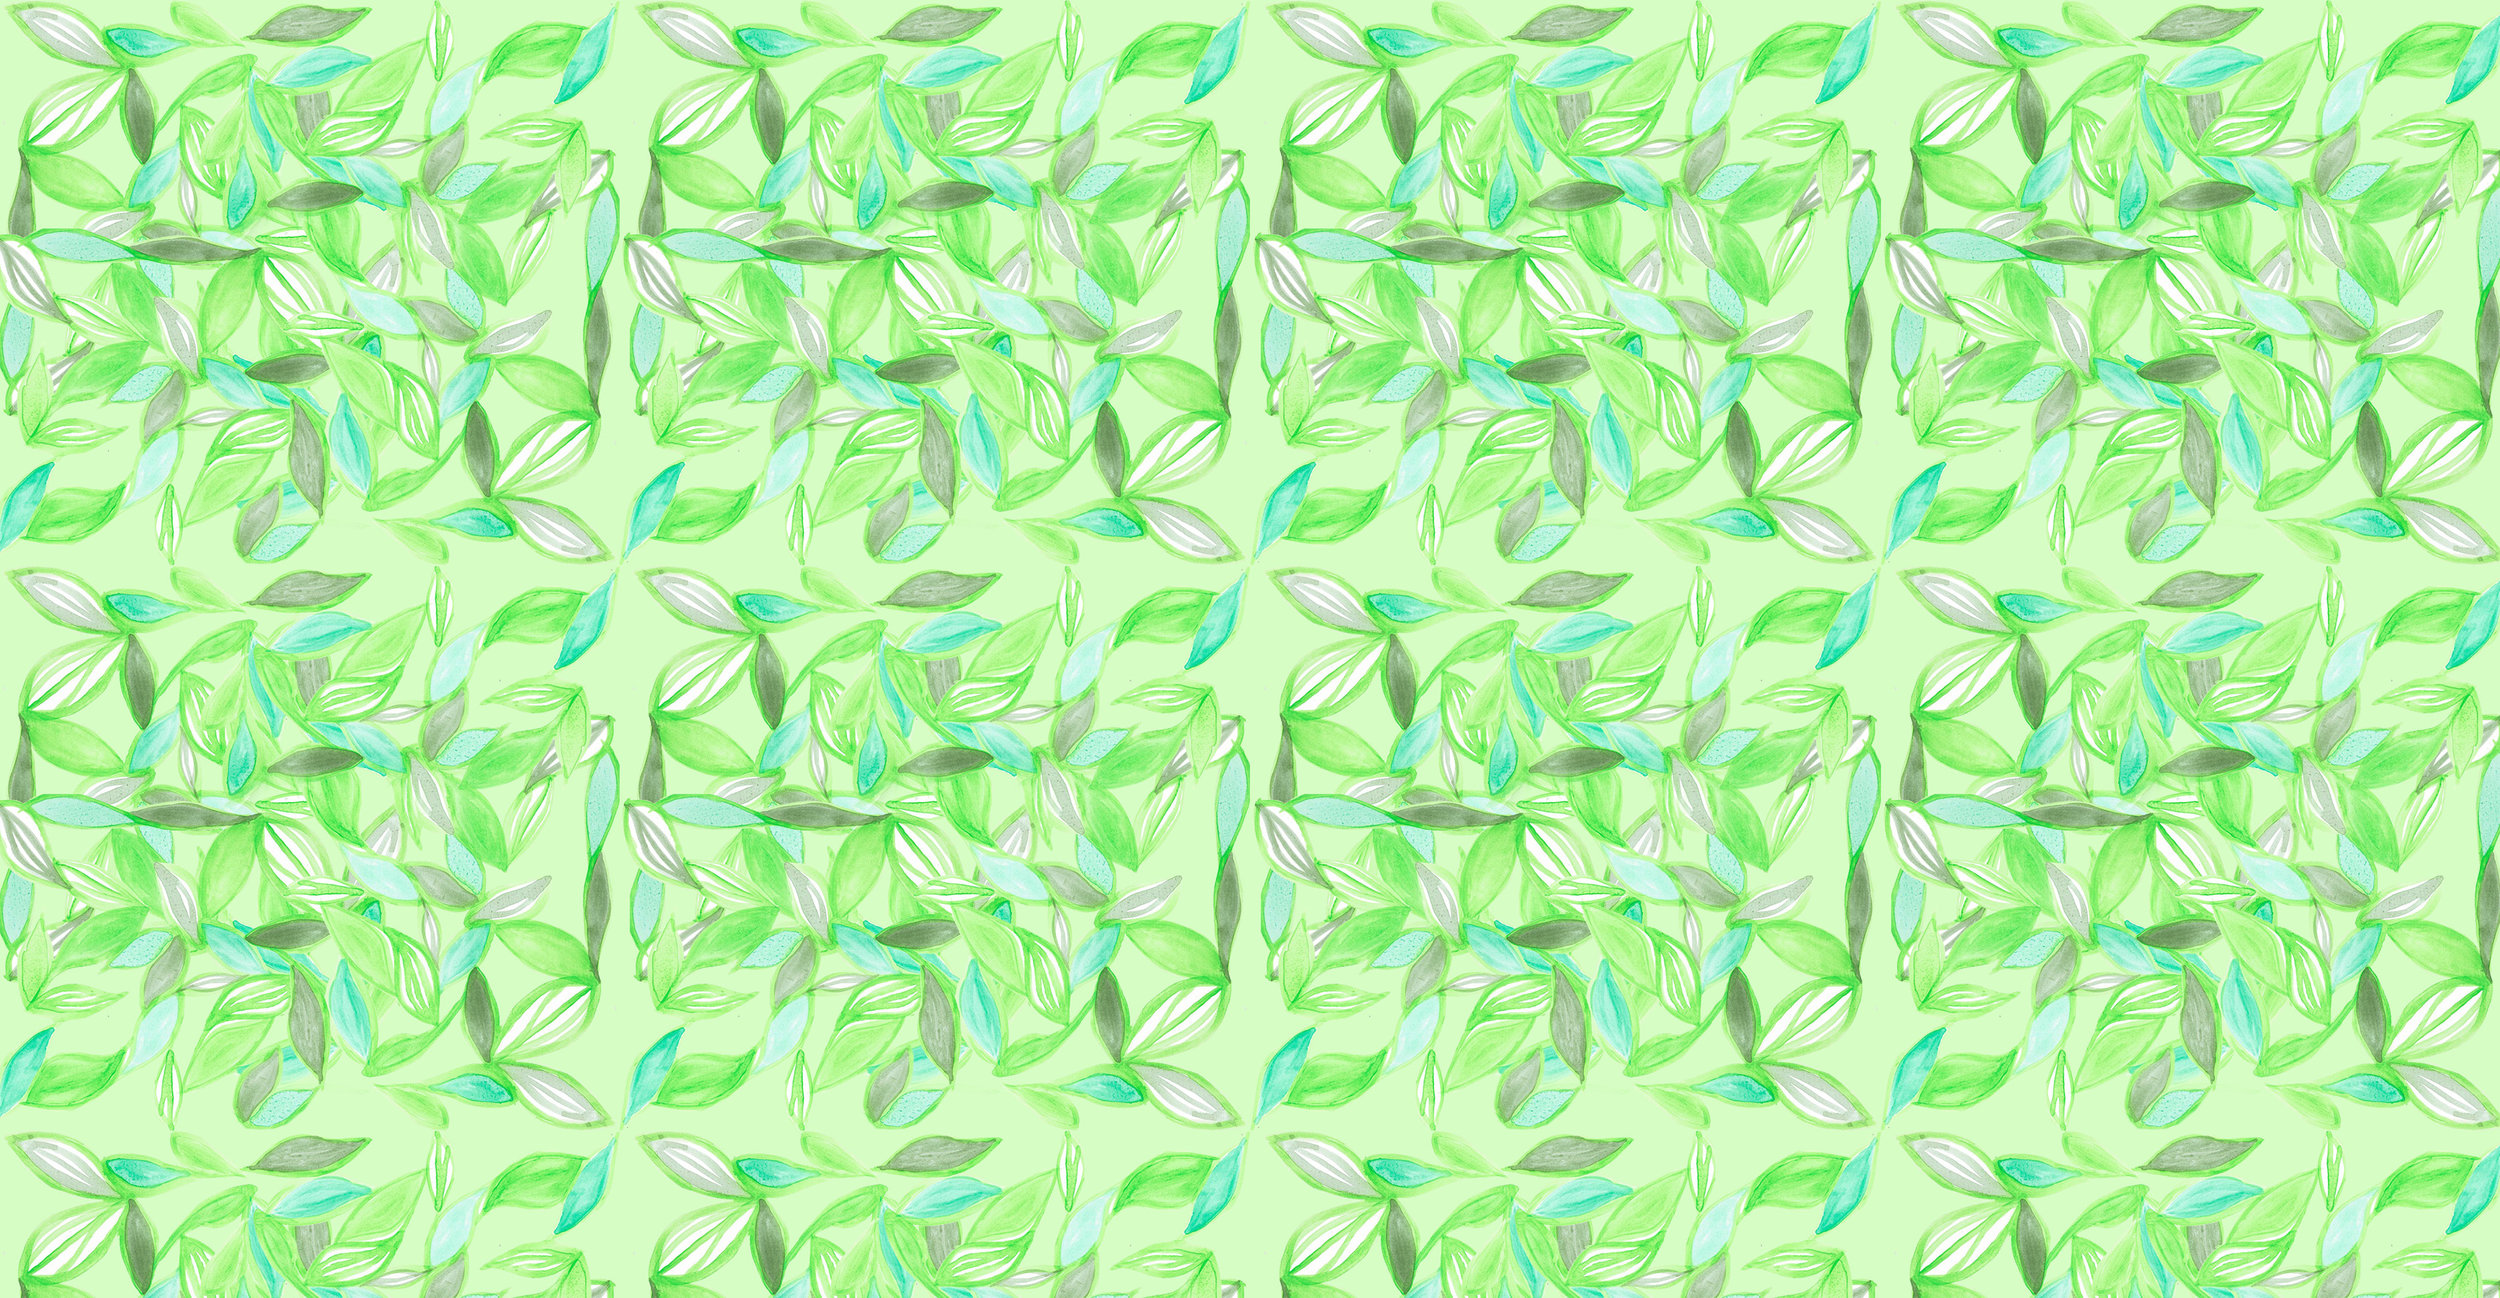 leavessssss.jpg